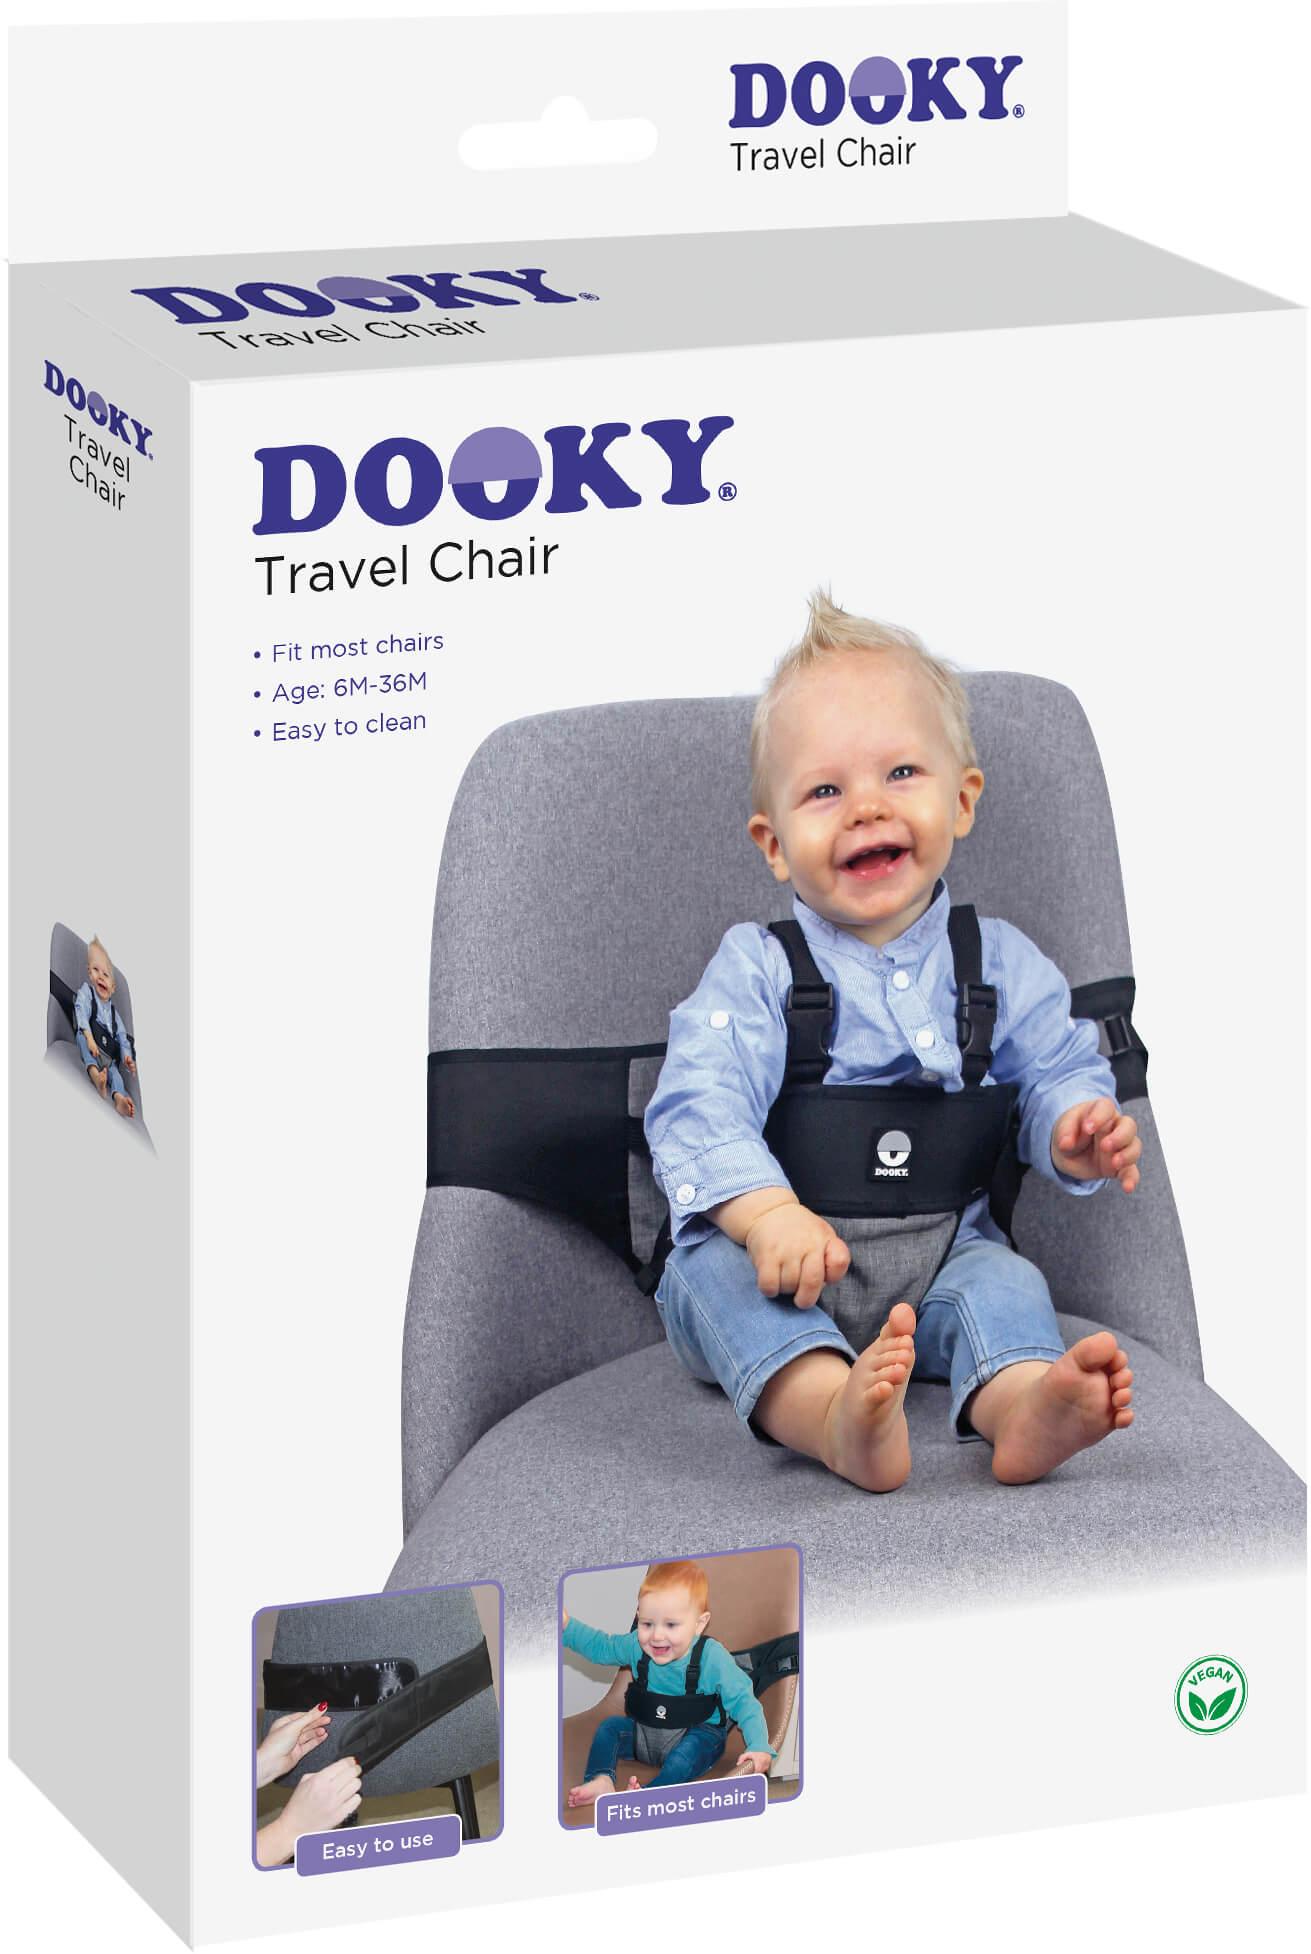 Dooky, travel chair, gadget